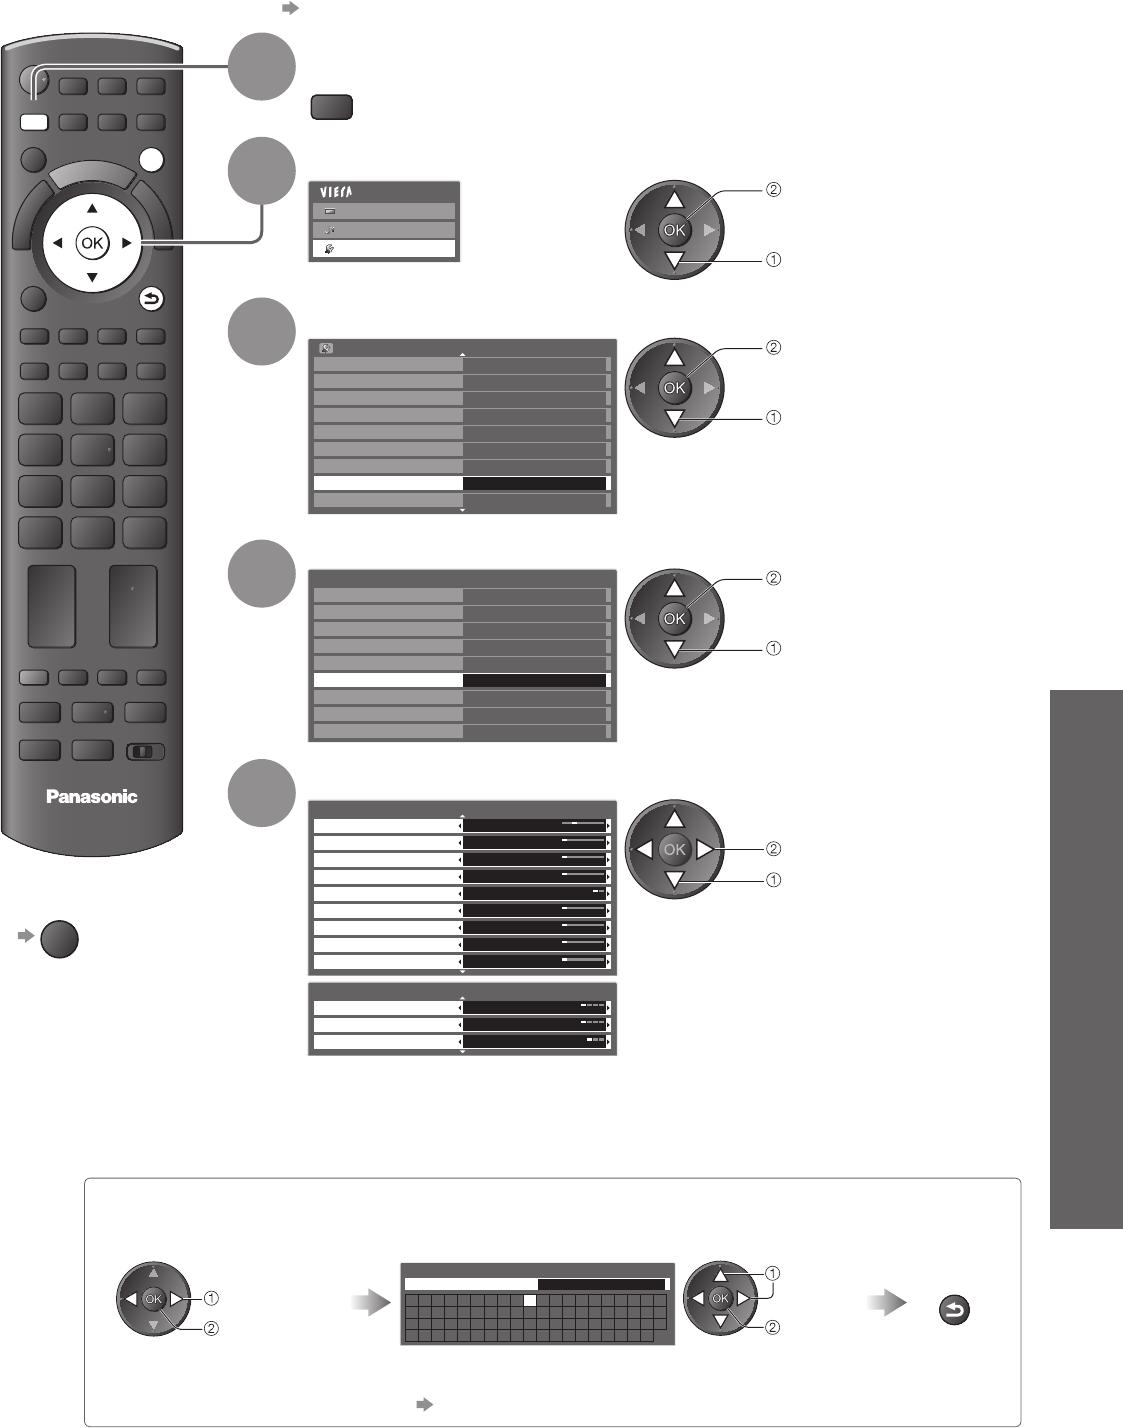 panasonic phone kx dt343 manual